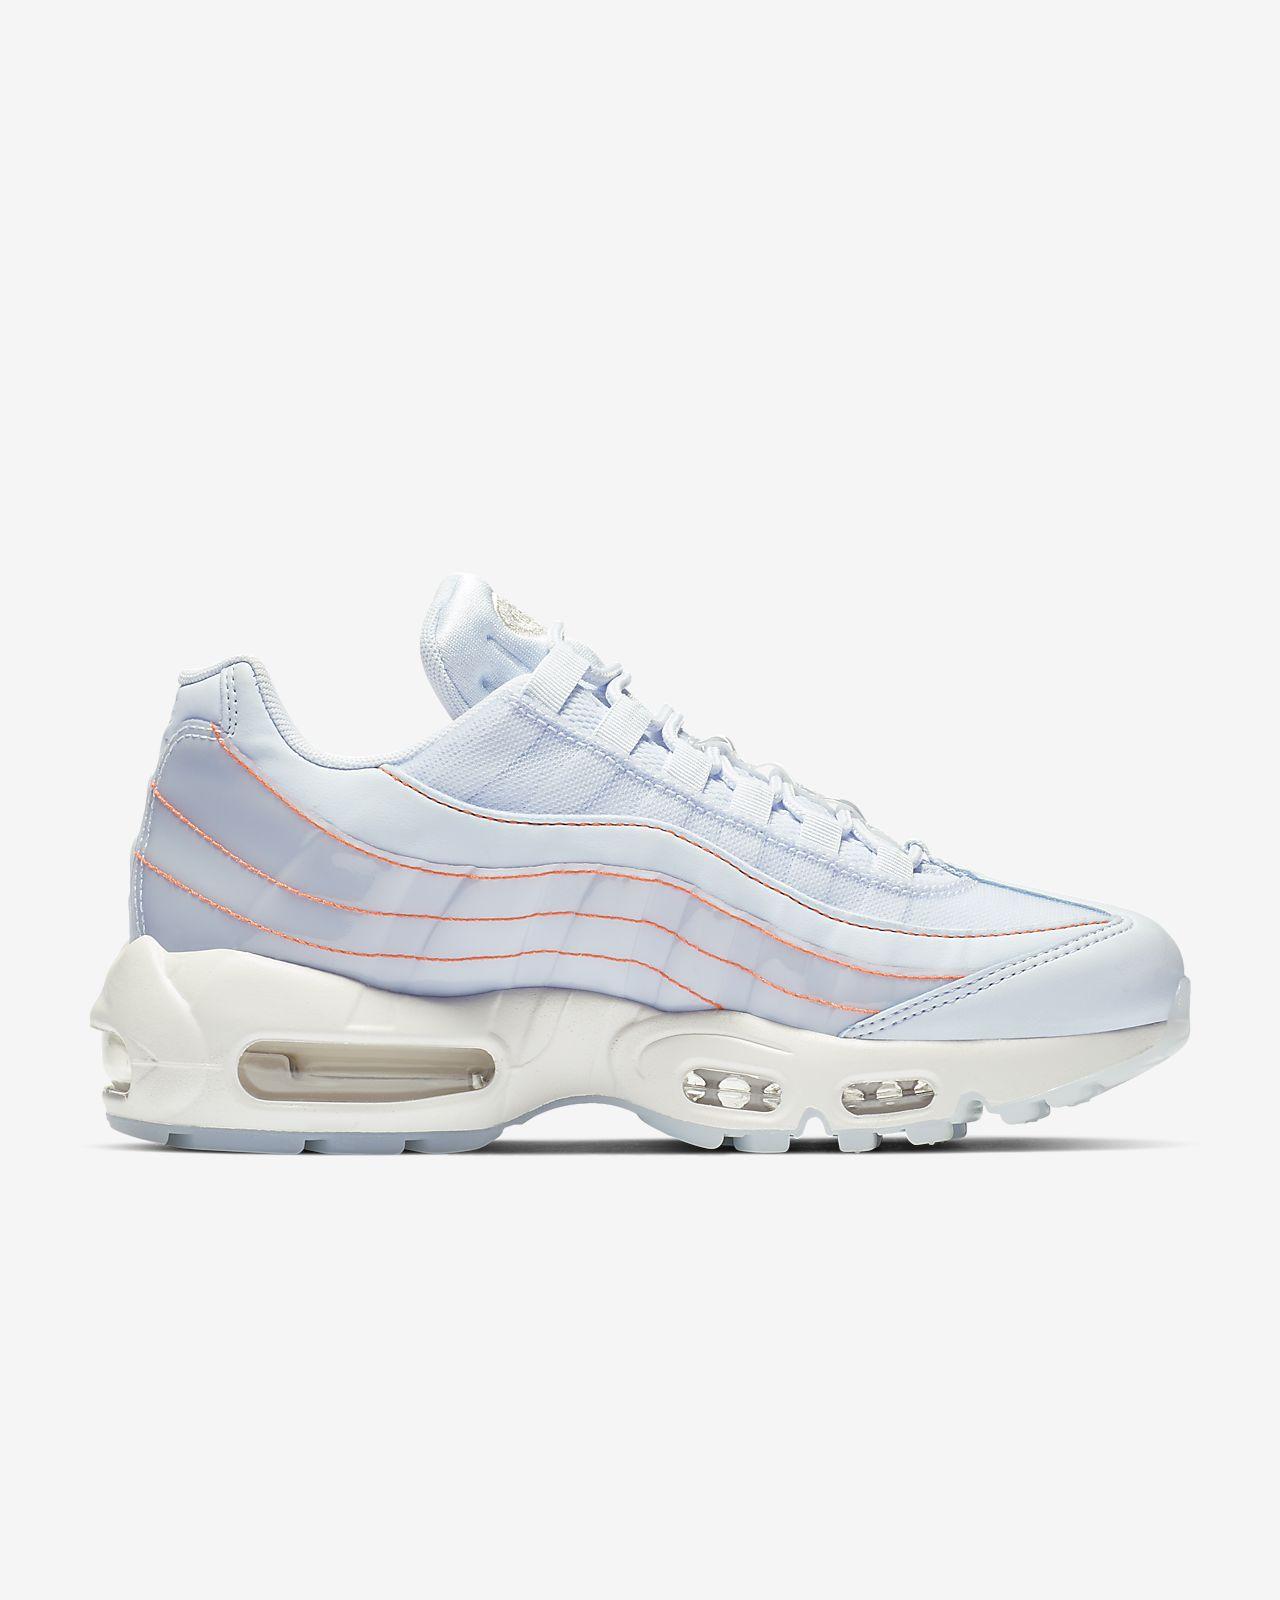 new style deef3 ebd3b ... Nike Air Max 95 SE Women s Shoe